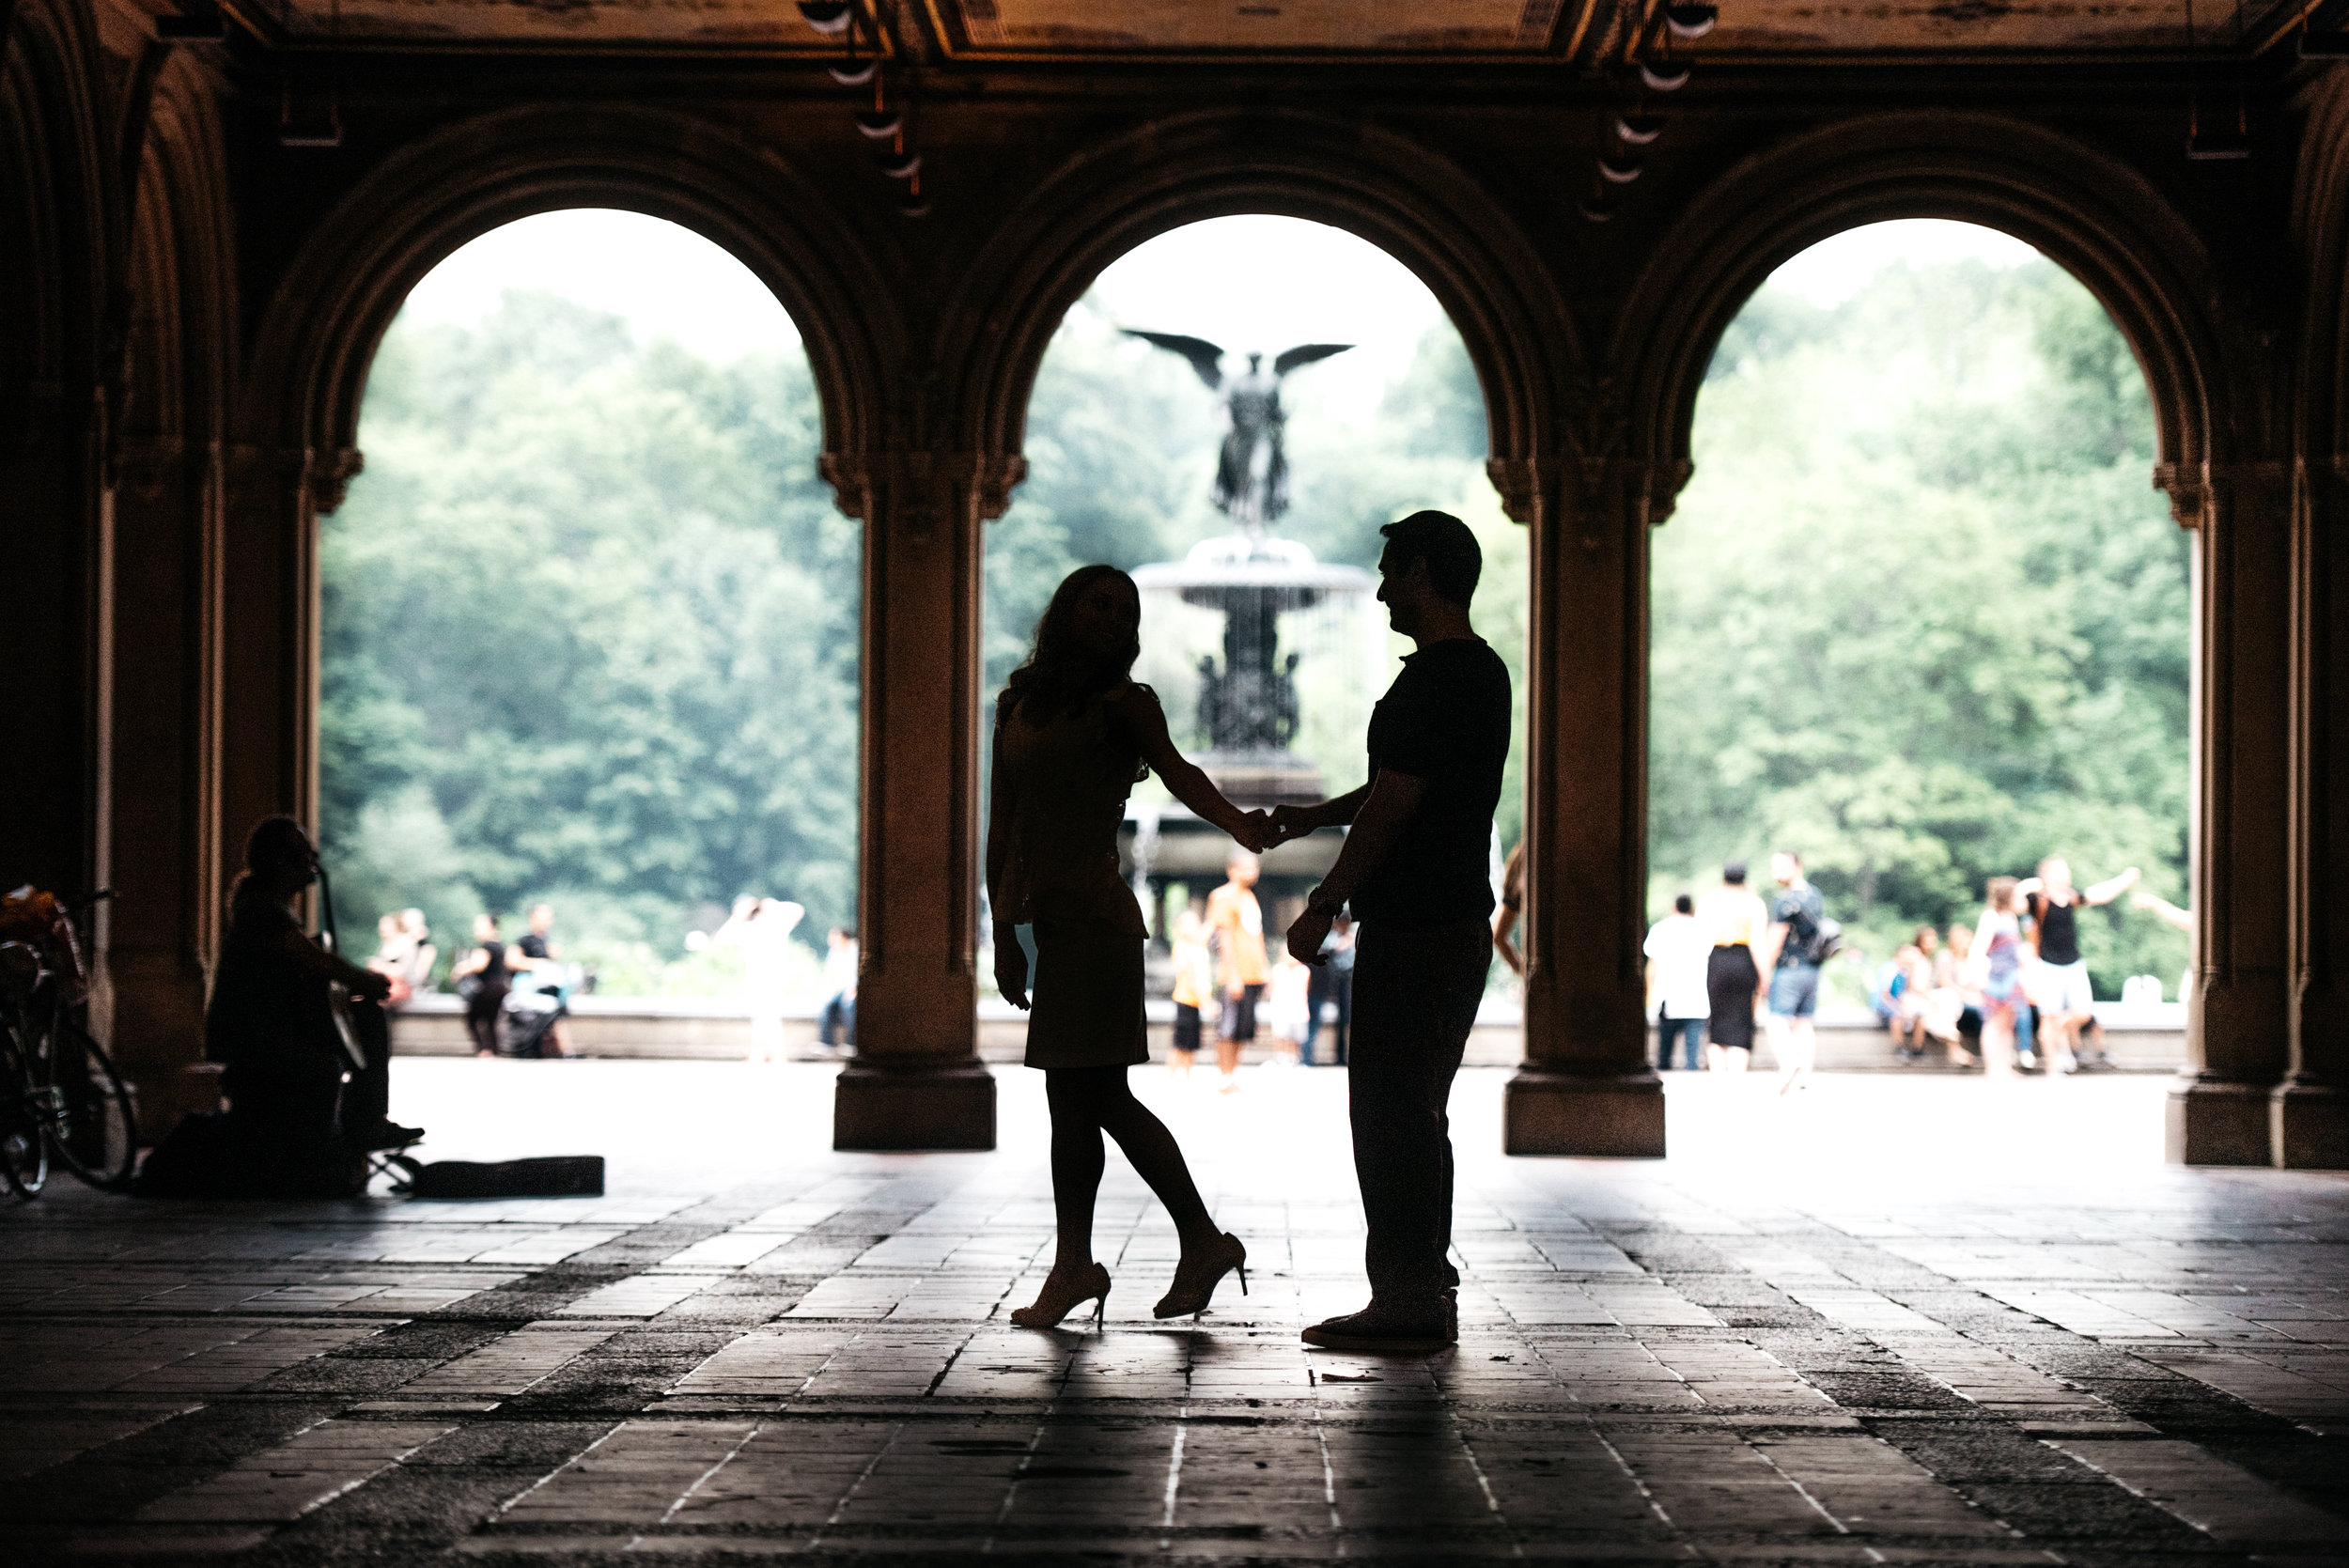 WeddingPhotos | NJPhotographer | Highlights-1-84.jpg